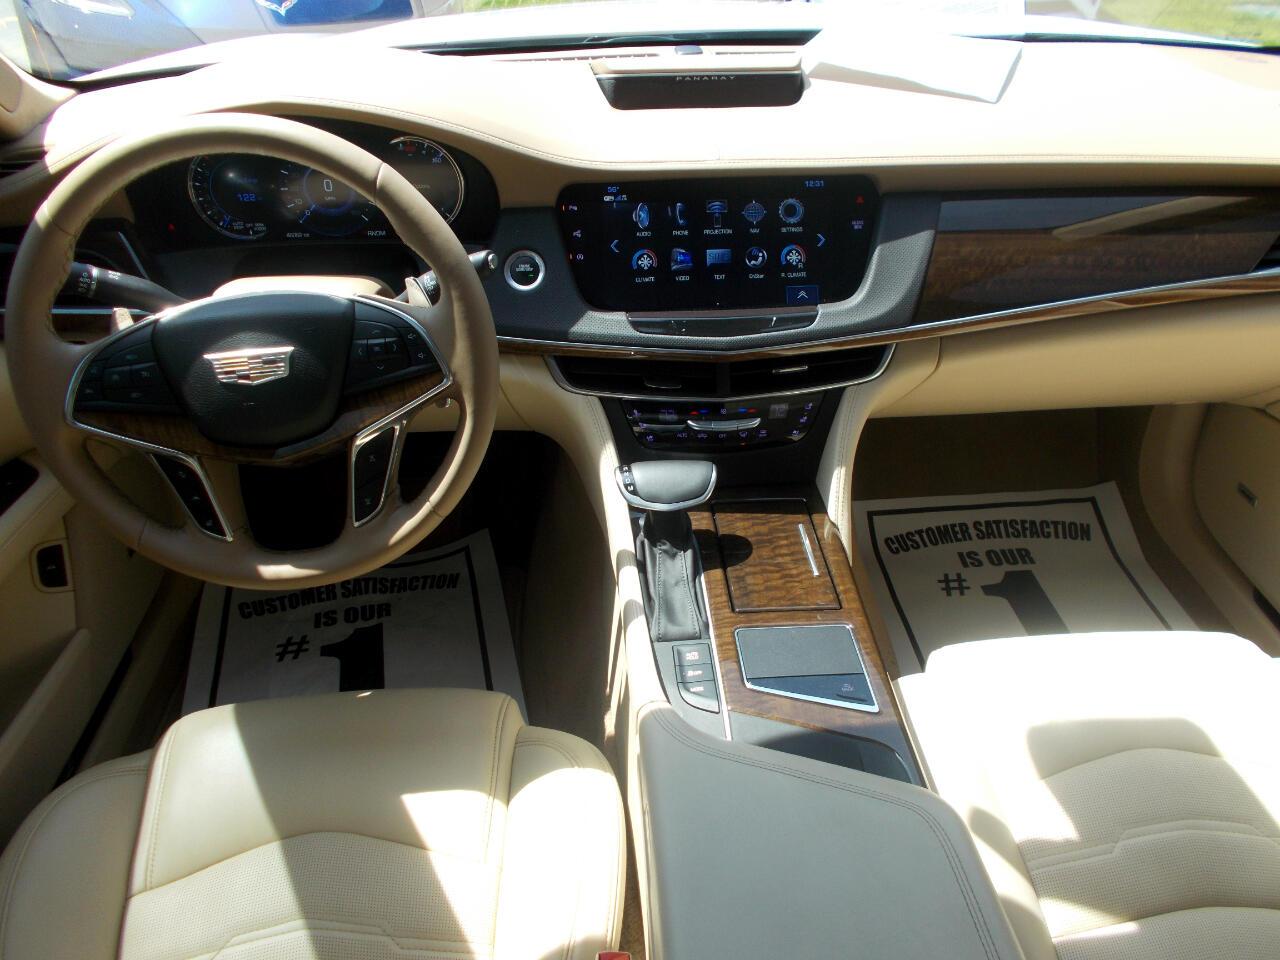 2017 Cadillac CT6 4dr Sdn 3.0L Turbo Platinum AWD